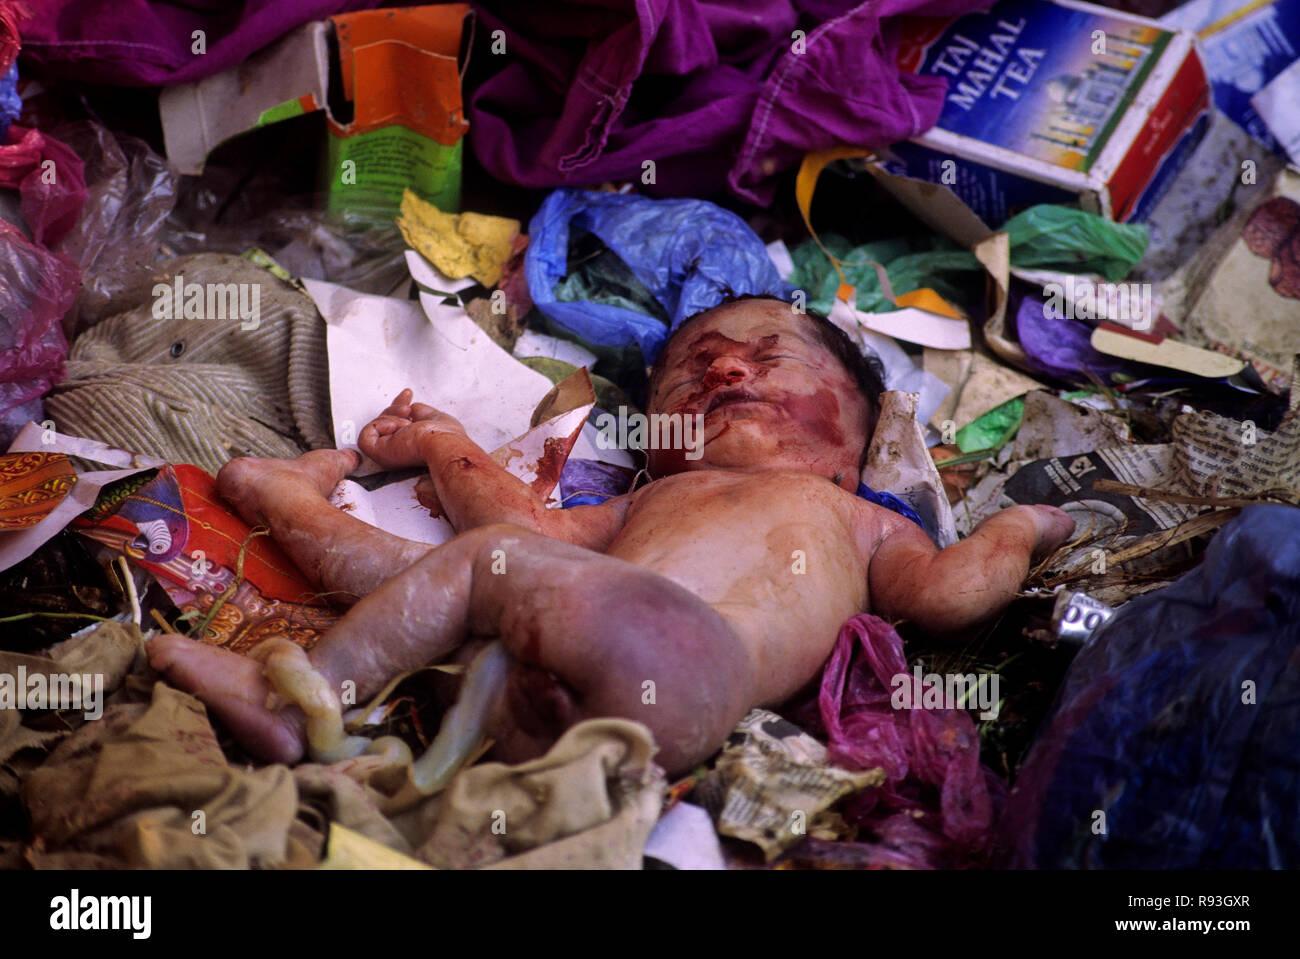 child killed and left in dustbin, bombay mumbai, maharashtra, india - Stock Image